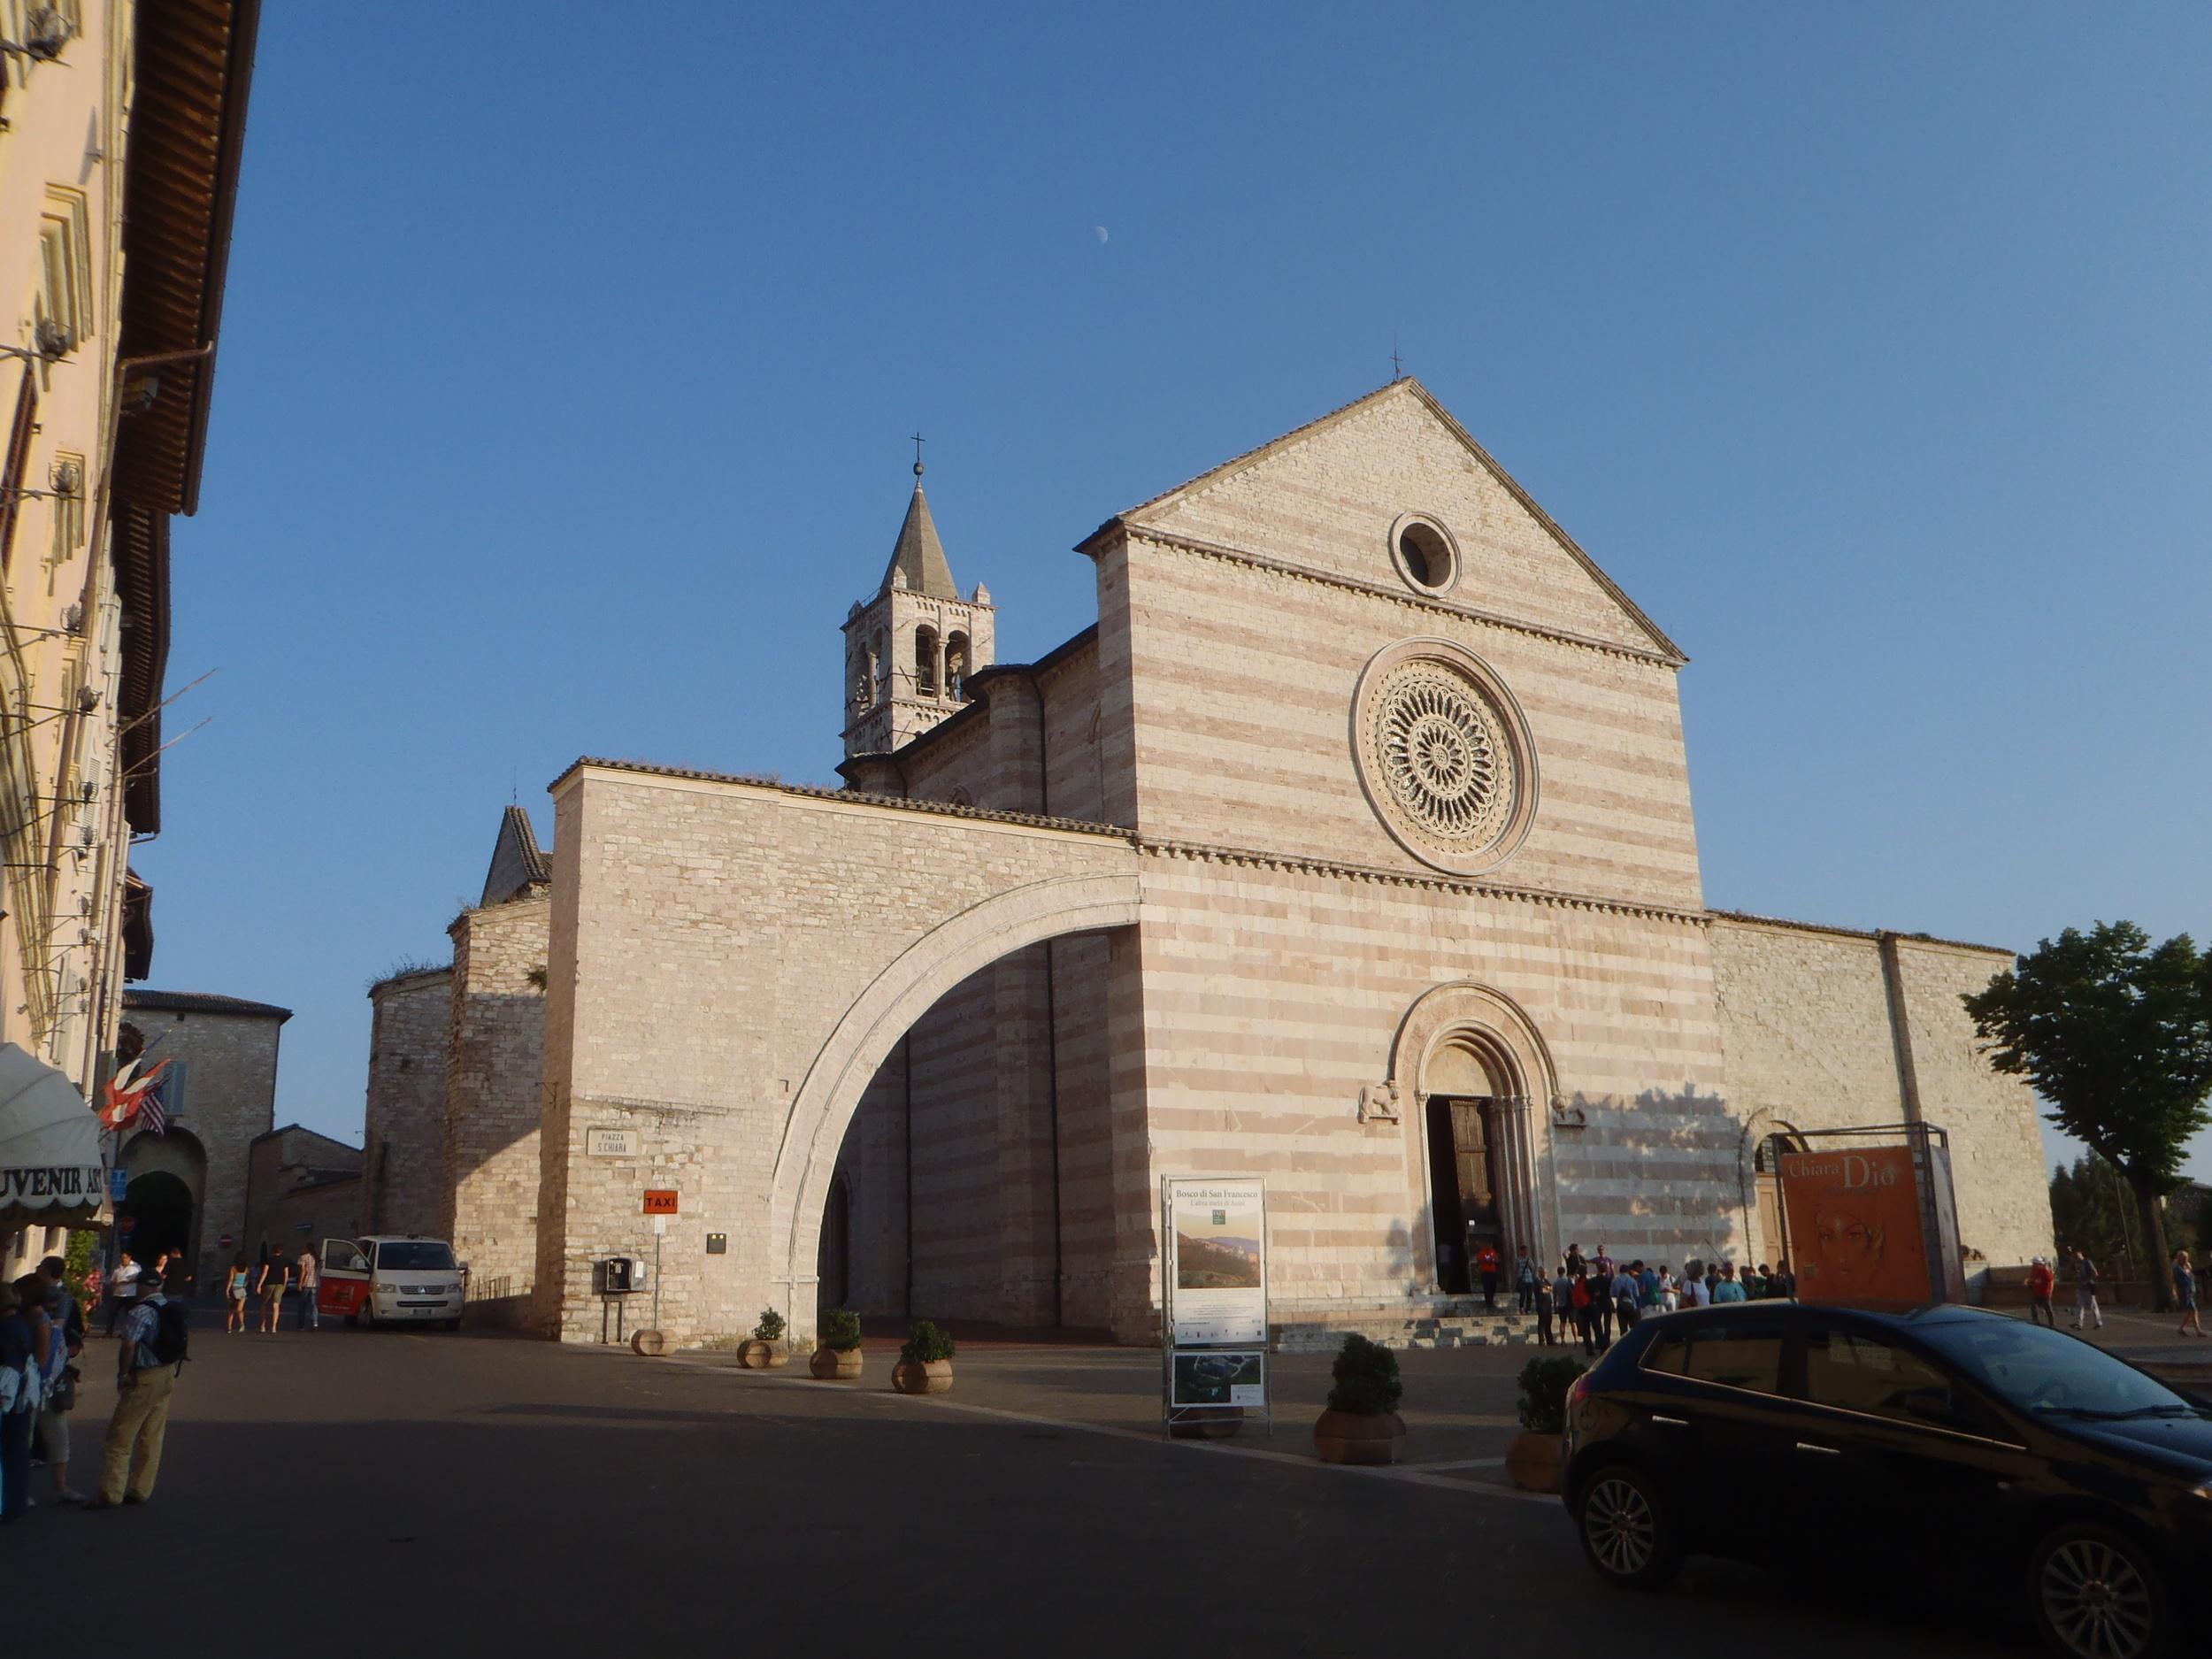 CRO Italy web 2013 - 025.JPG